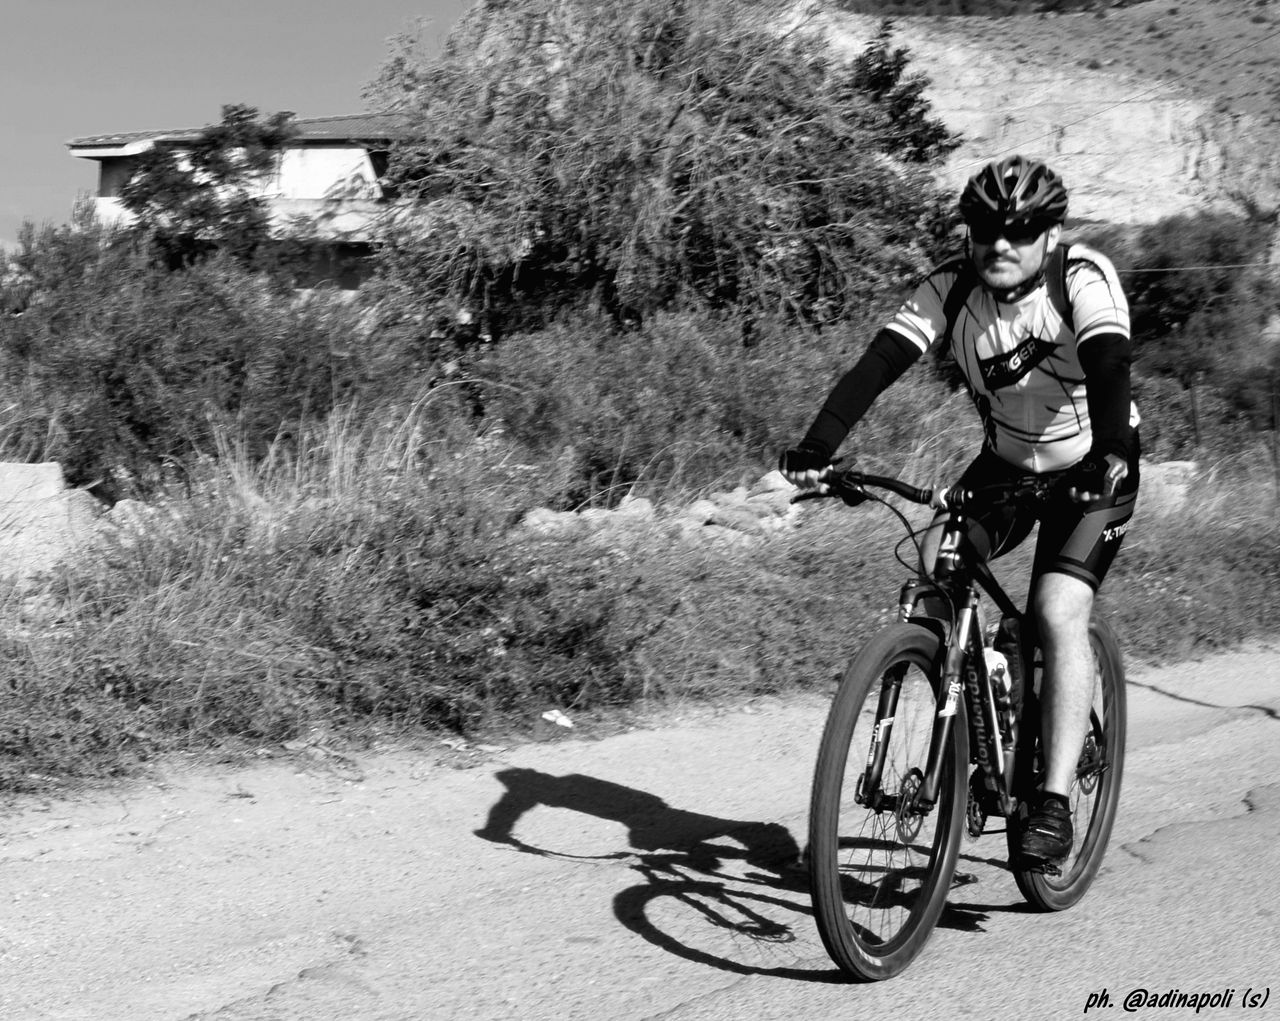 ombraciclista.jpg